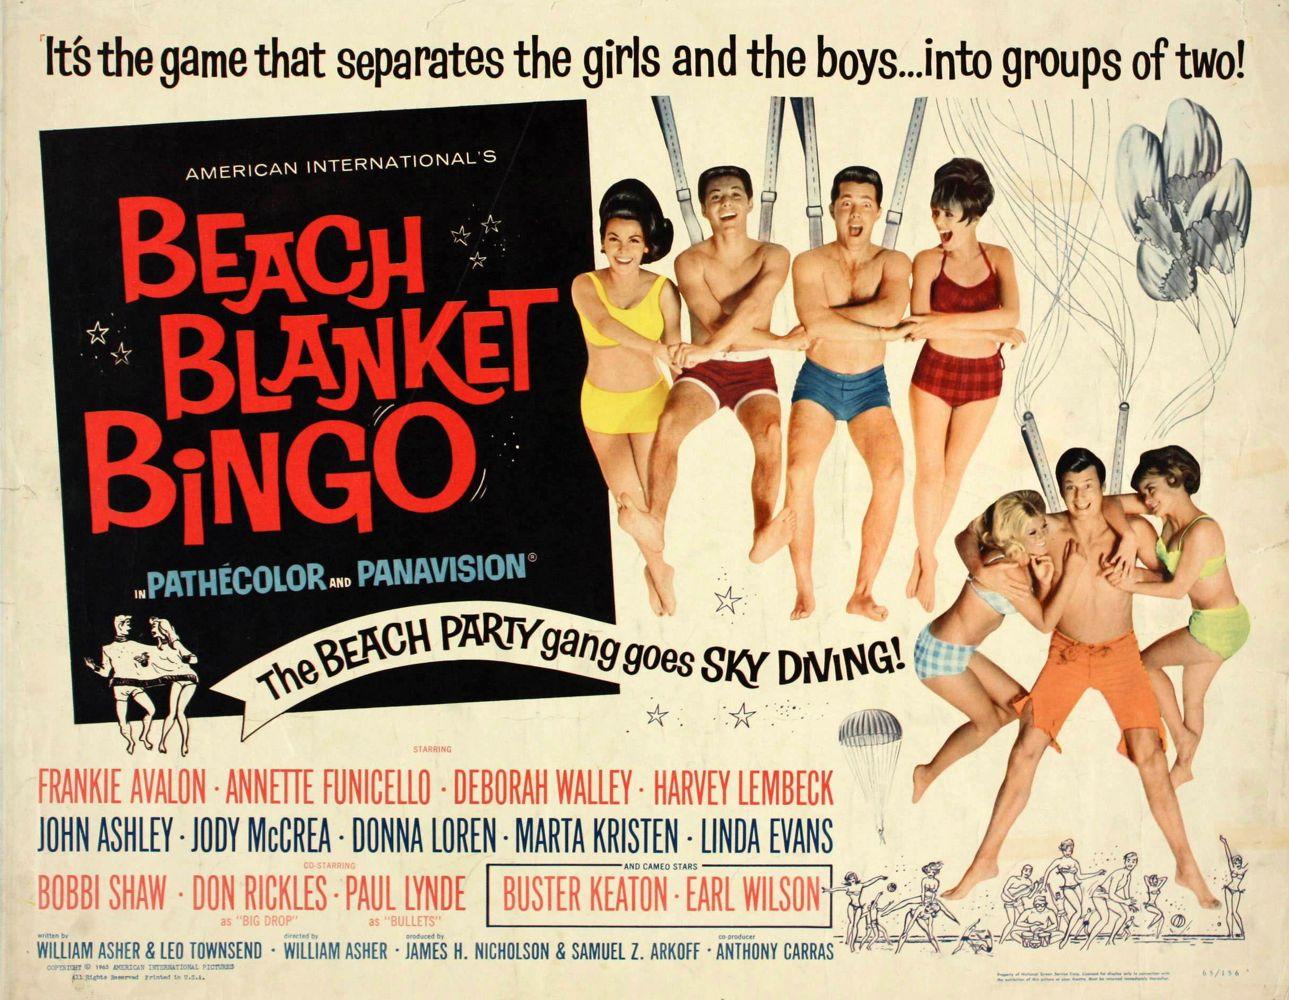 BeachBlanketBingoLobbyCardBaja